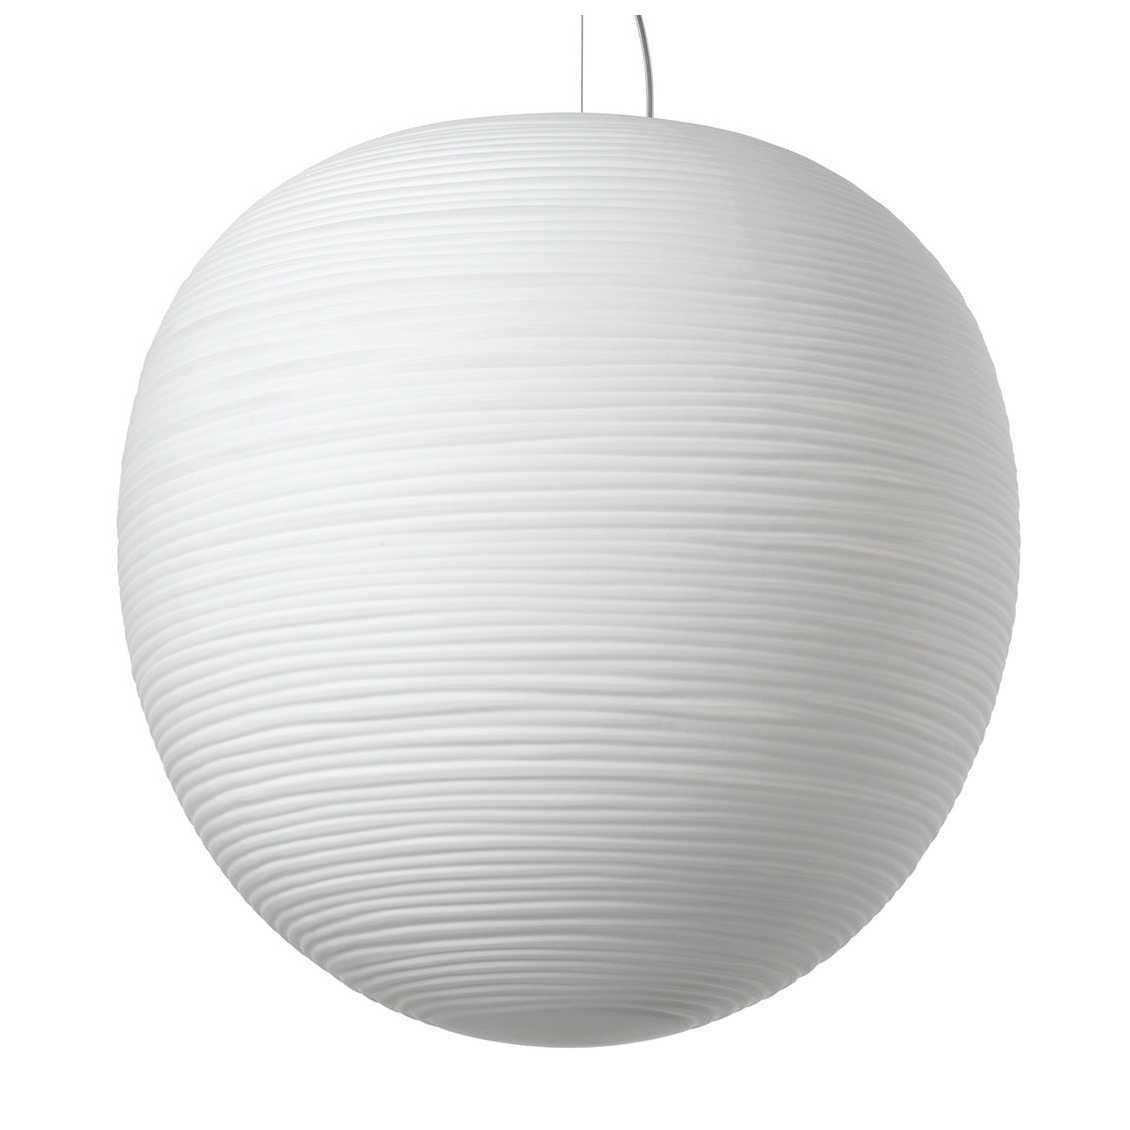 Foscarini Rituals XL Hanglamp LED Snoer 10 Meter